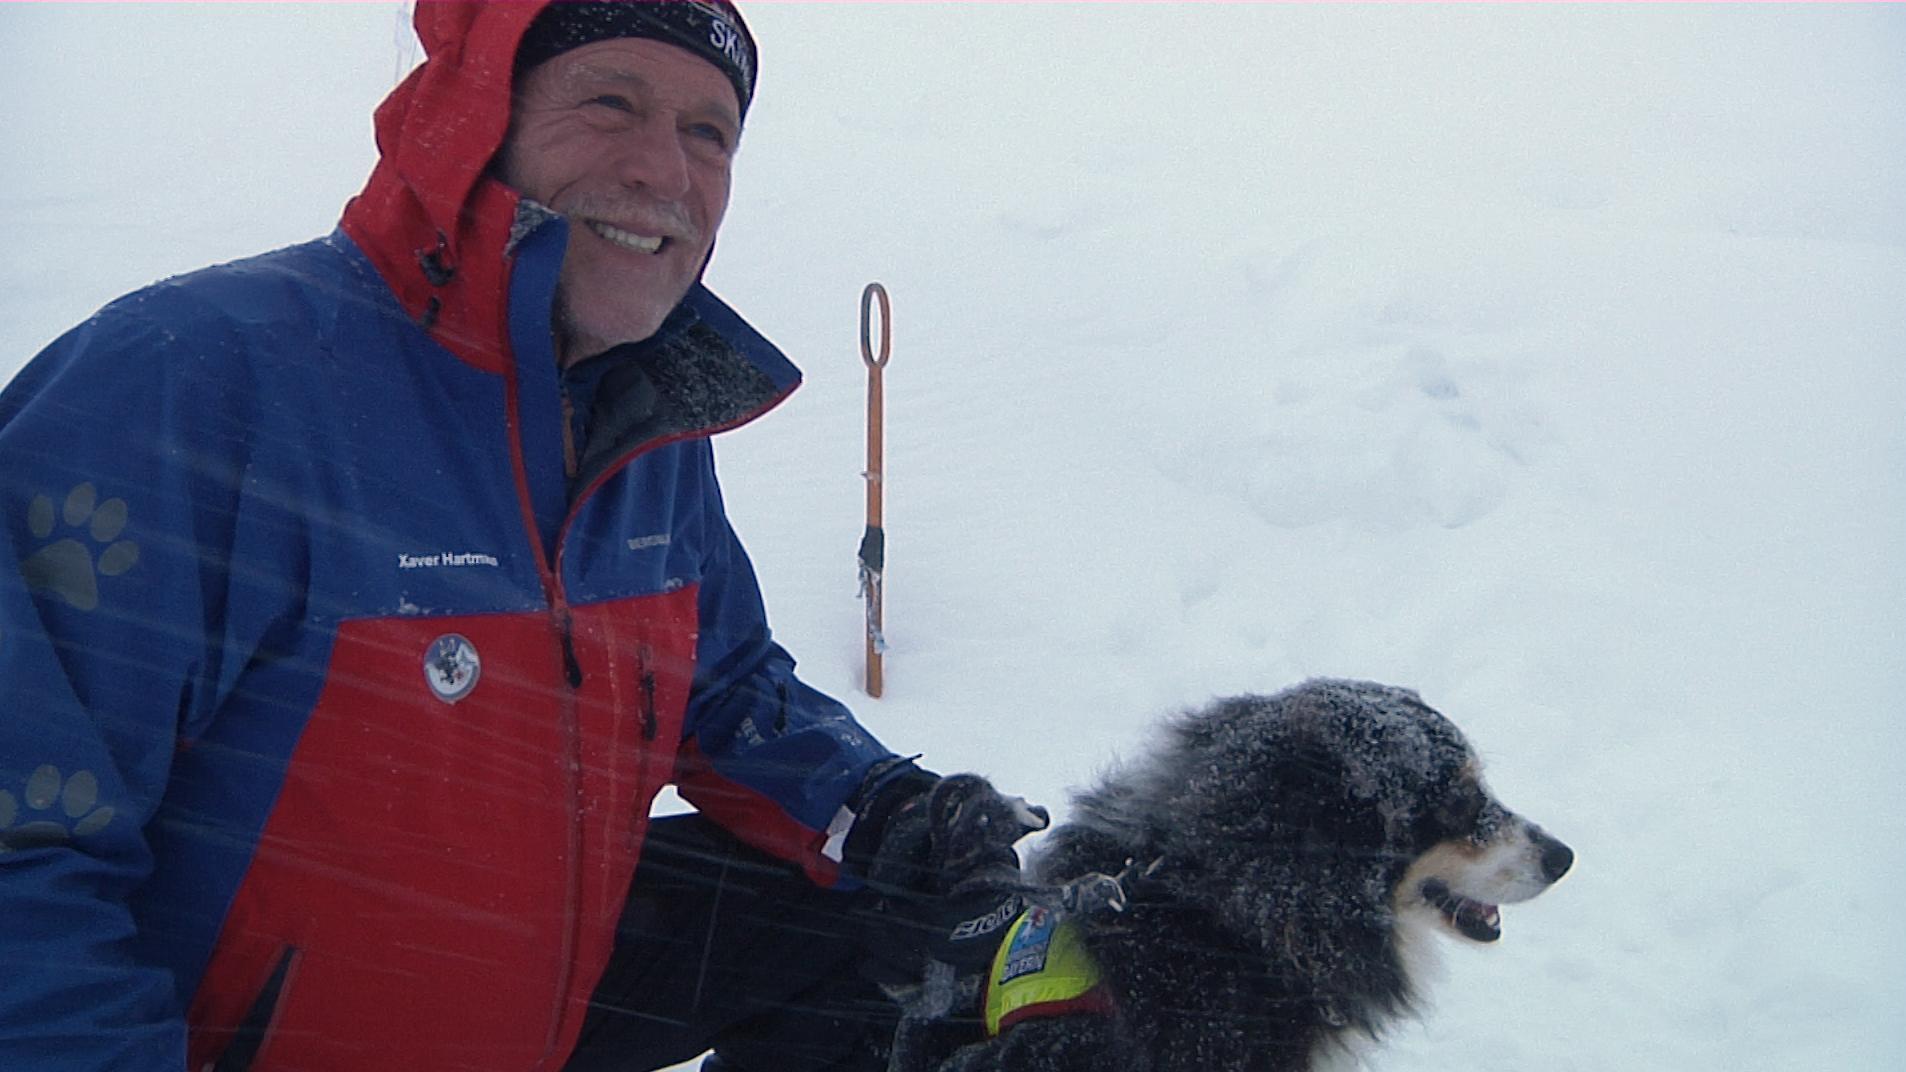 Xaver Hartmann, Leiter der Lawinenhundestaffel der Allgäuer Bergwacht, mit Lawinenhündin Lusi